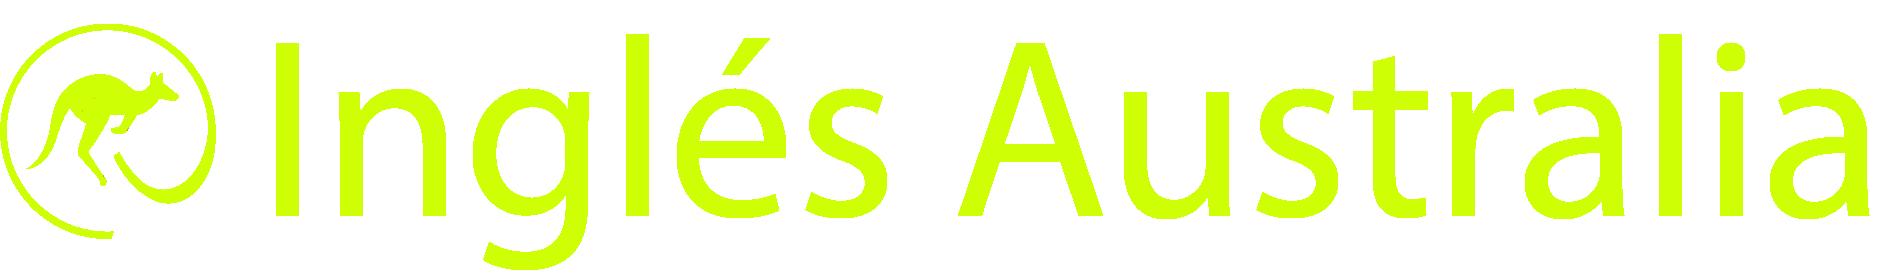 ingles australia logo